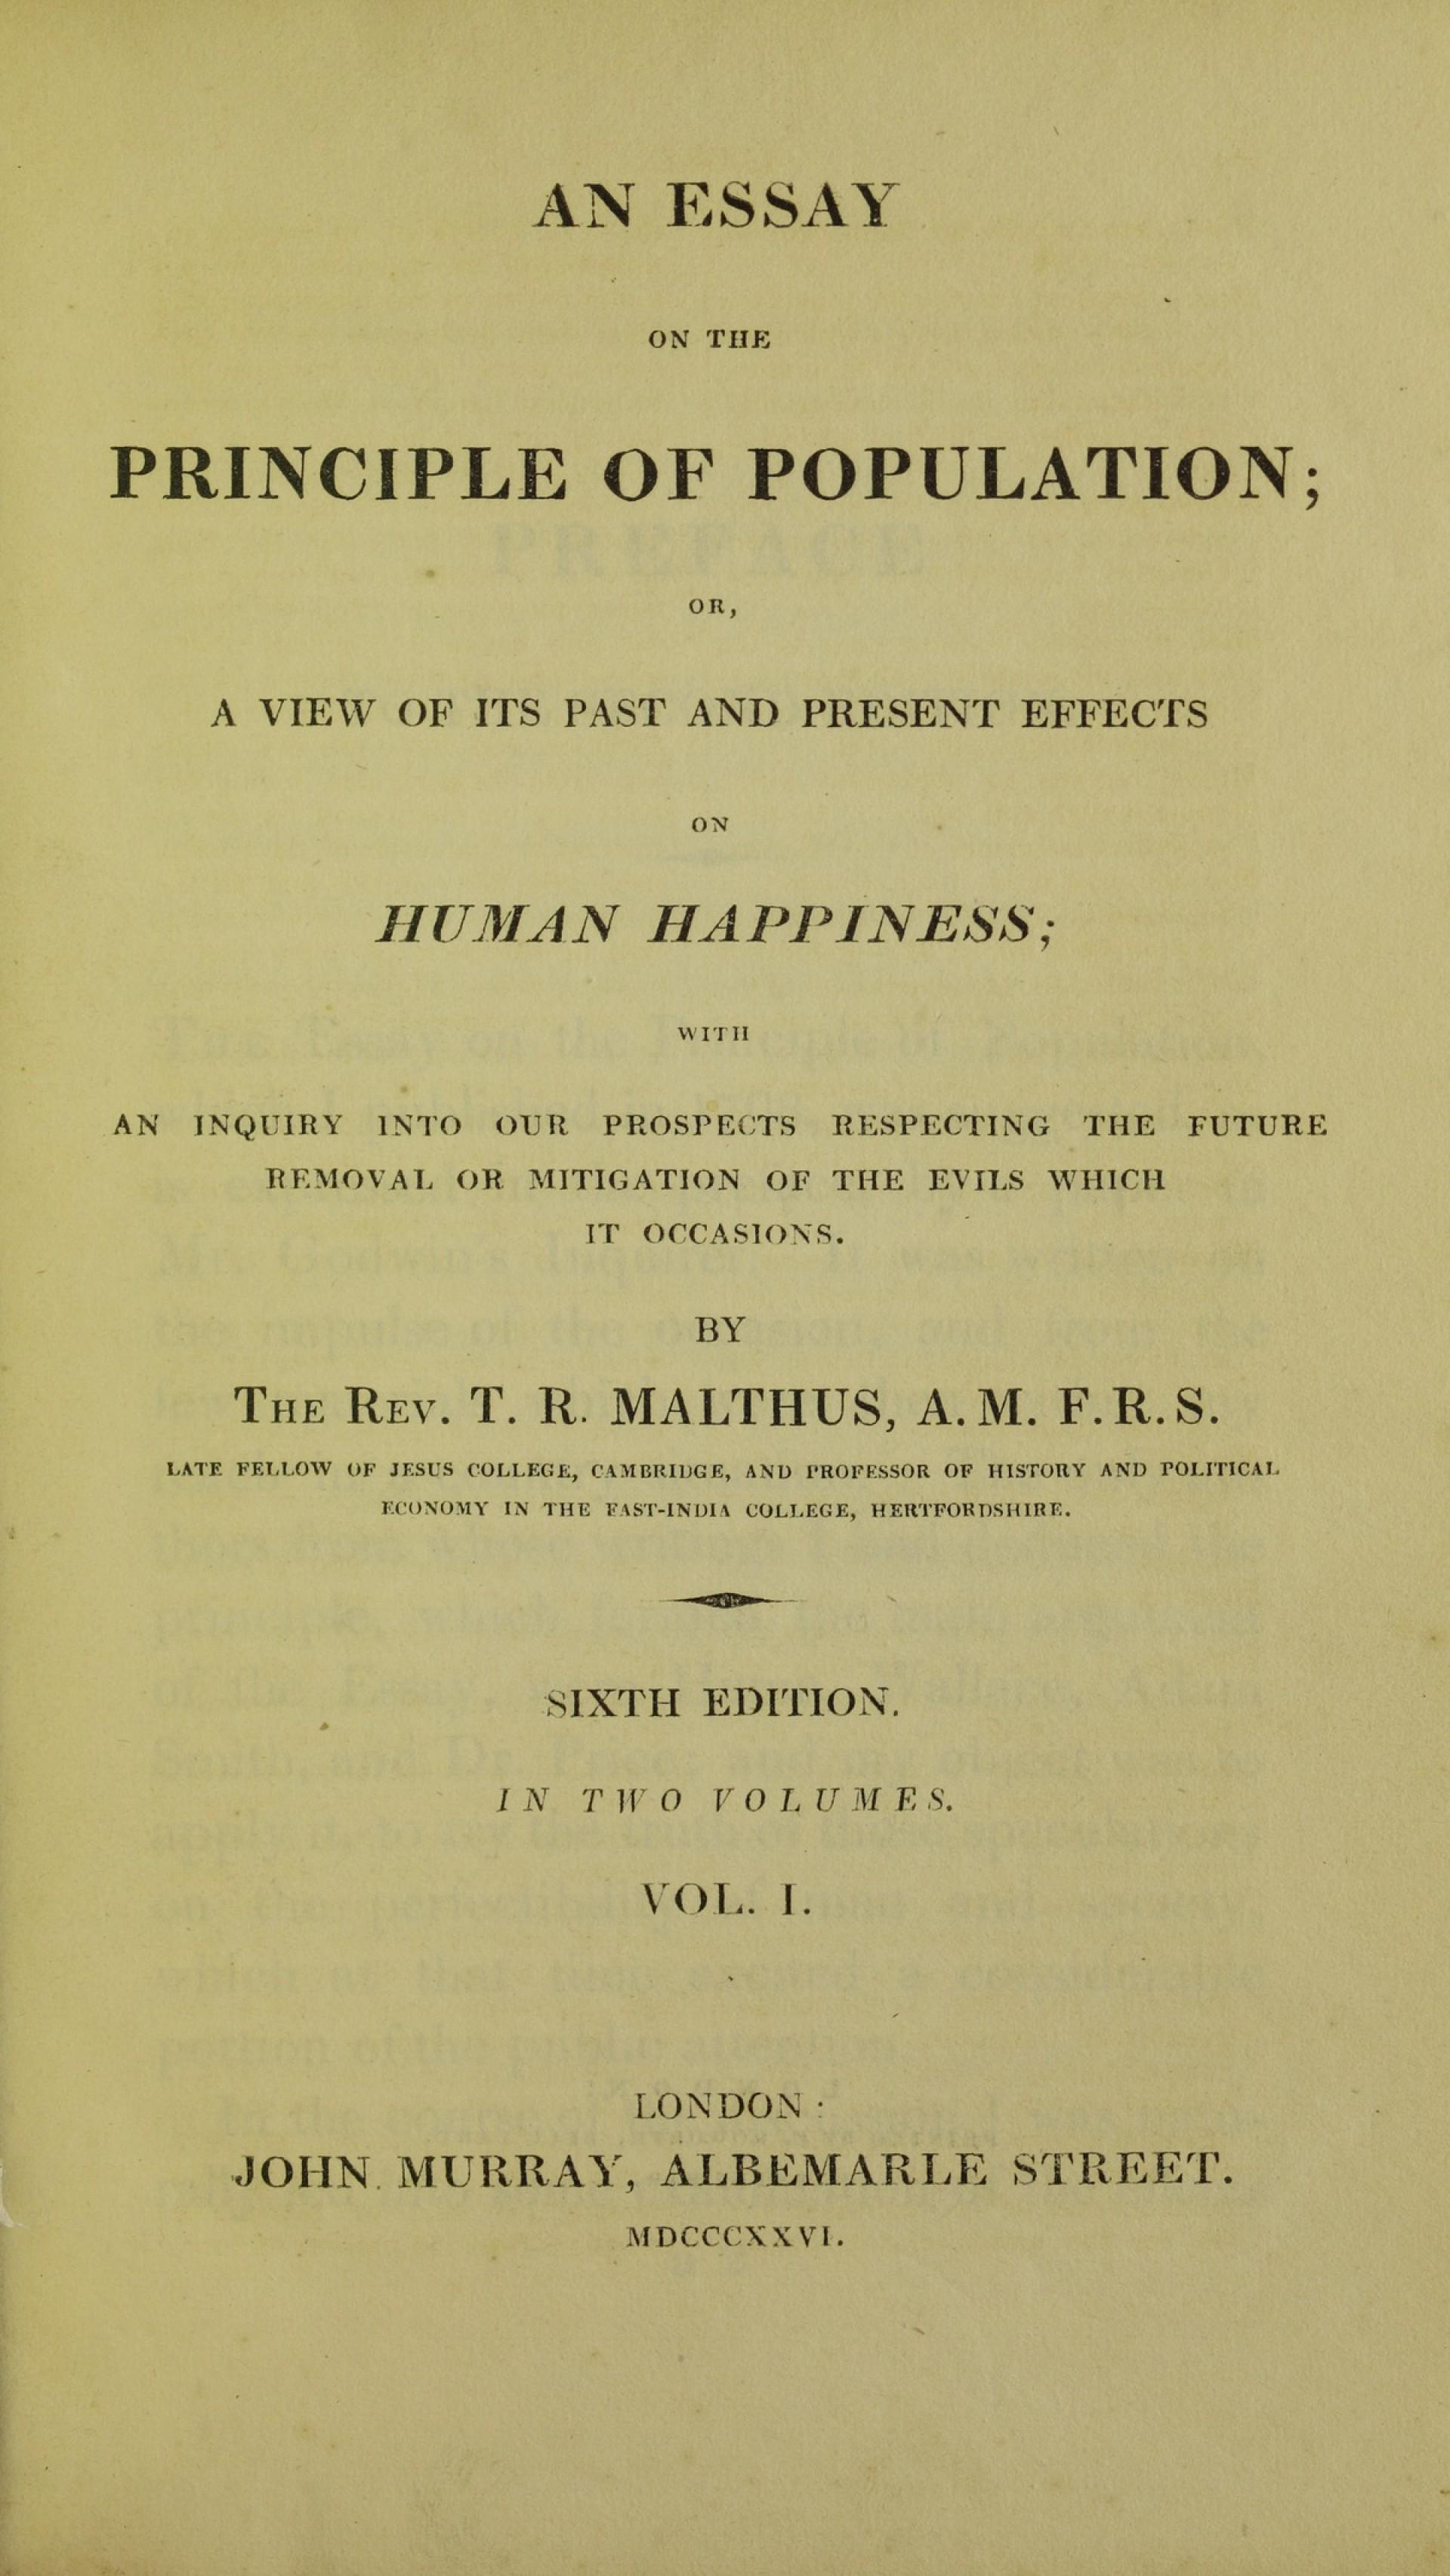 004 Essay On The Principle Of Population Example Lossy Page1 1200px Malthus  Population2c 1826 5884843 Singular Pdf By Thomas Main Idea1920